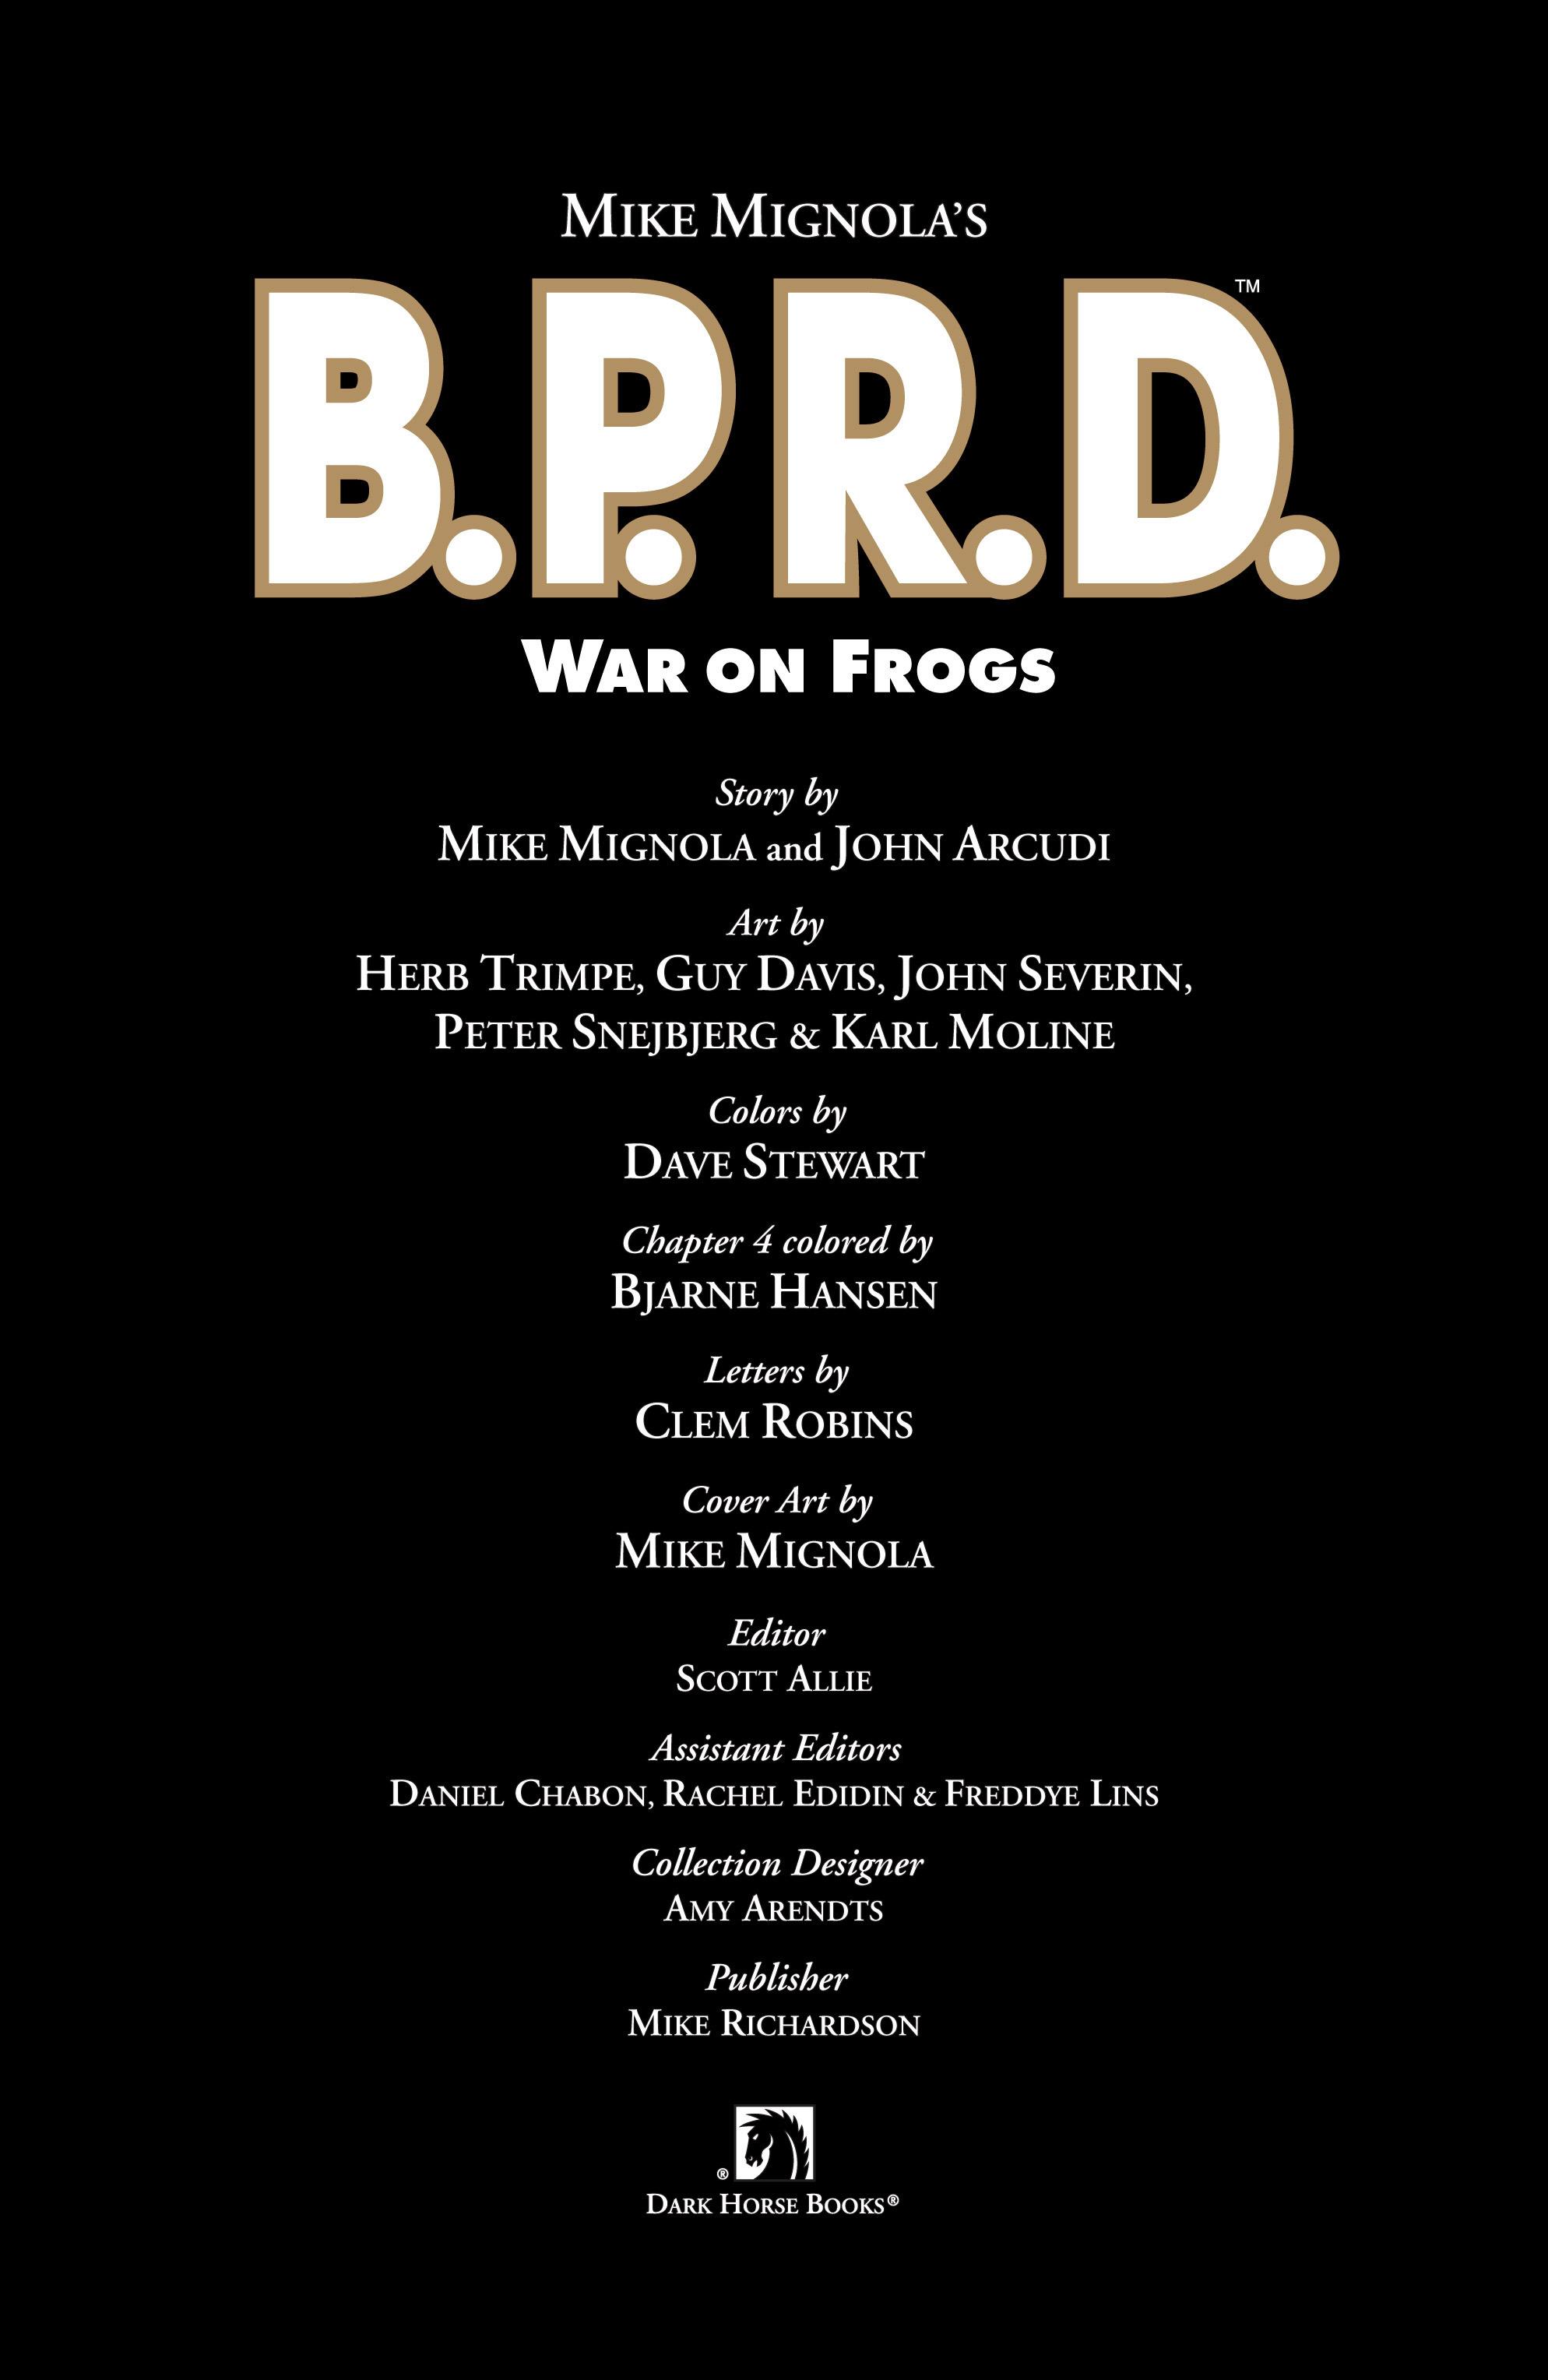 Read online B.P.R.D. (2003) comic -  Issue # TPB 12 - 5